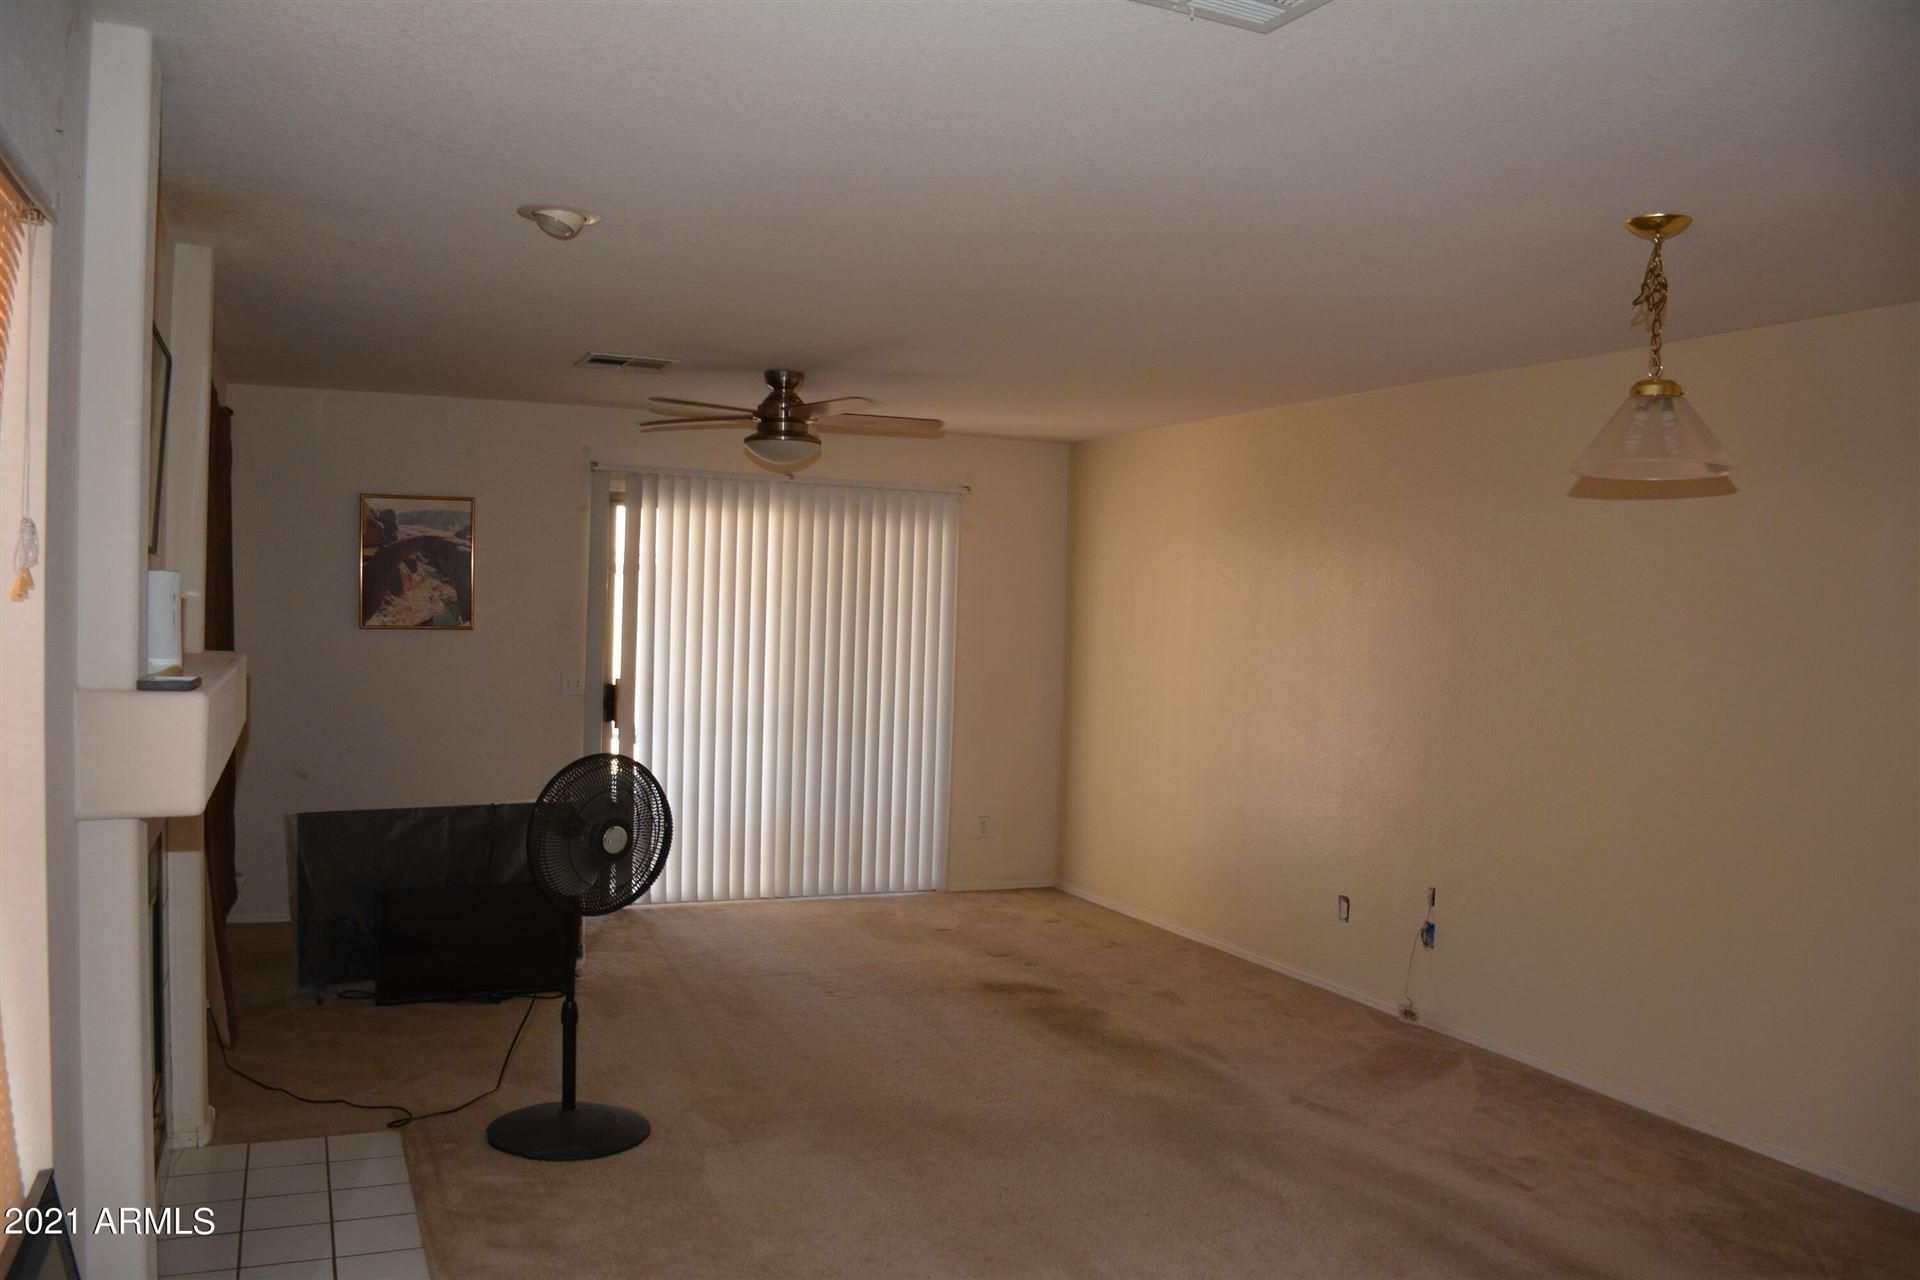 Photo of 1052 E GREENLEE Avenue, Apache Junction, AZ 85119 (MLS # 6304127)